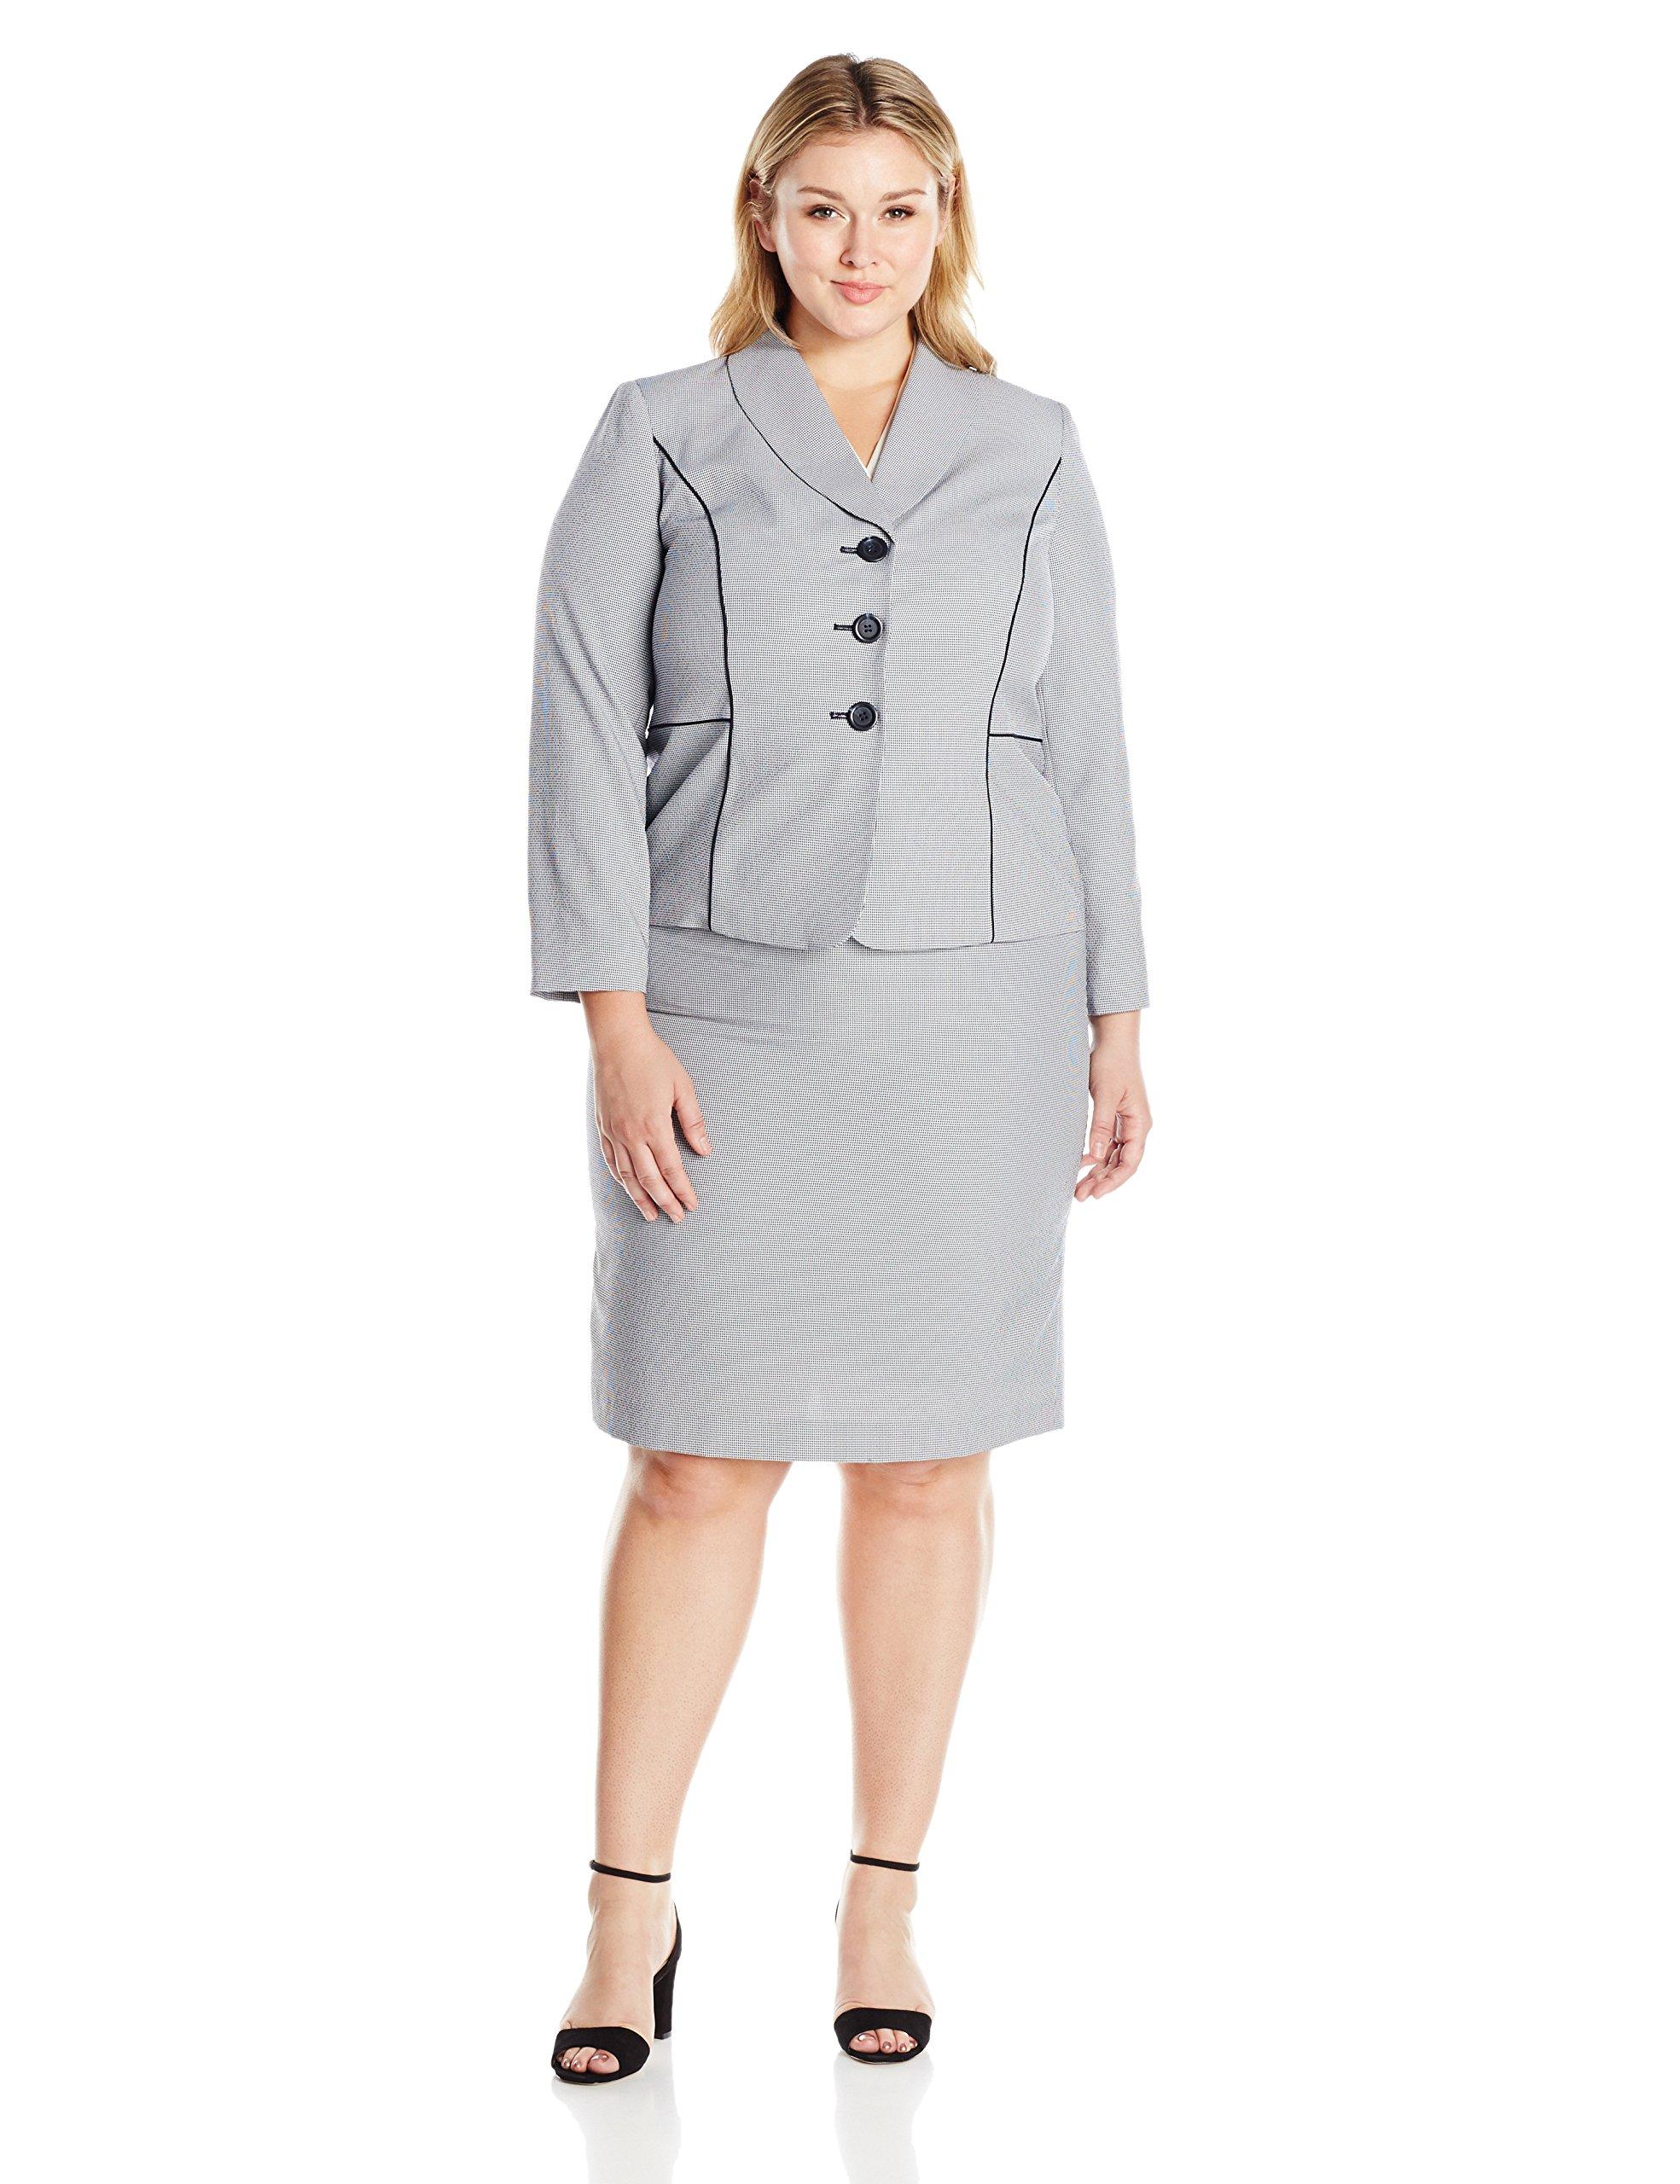 Le Suit Women's Plus Size Seersucker 3 Button Skirt, Navy Multi, 18W